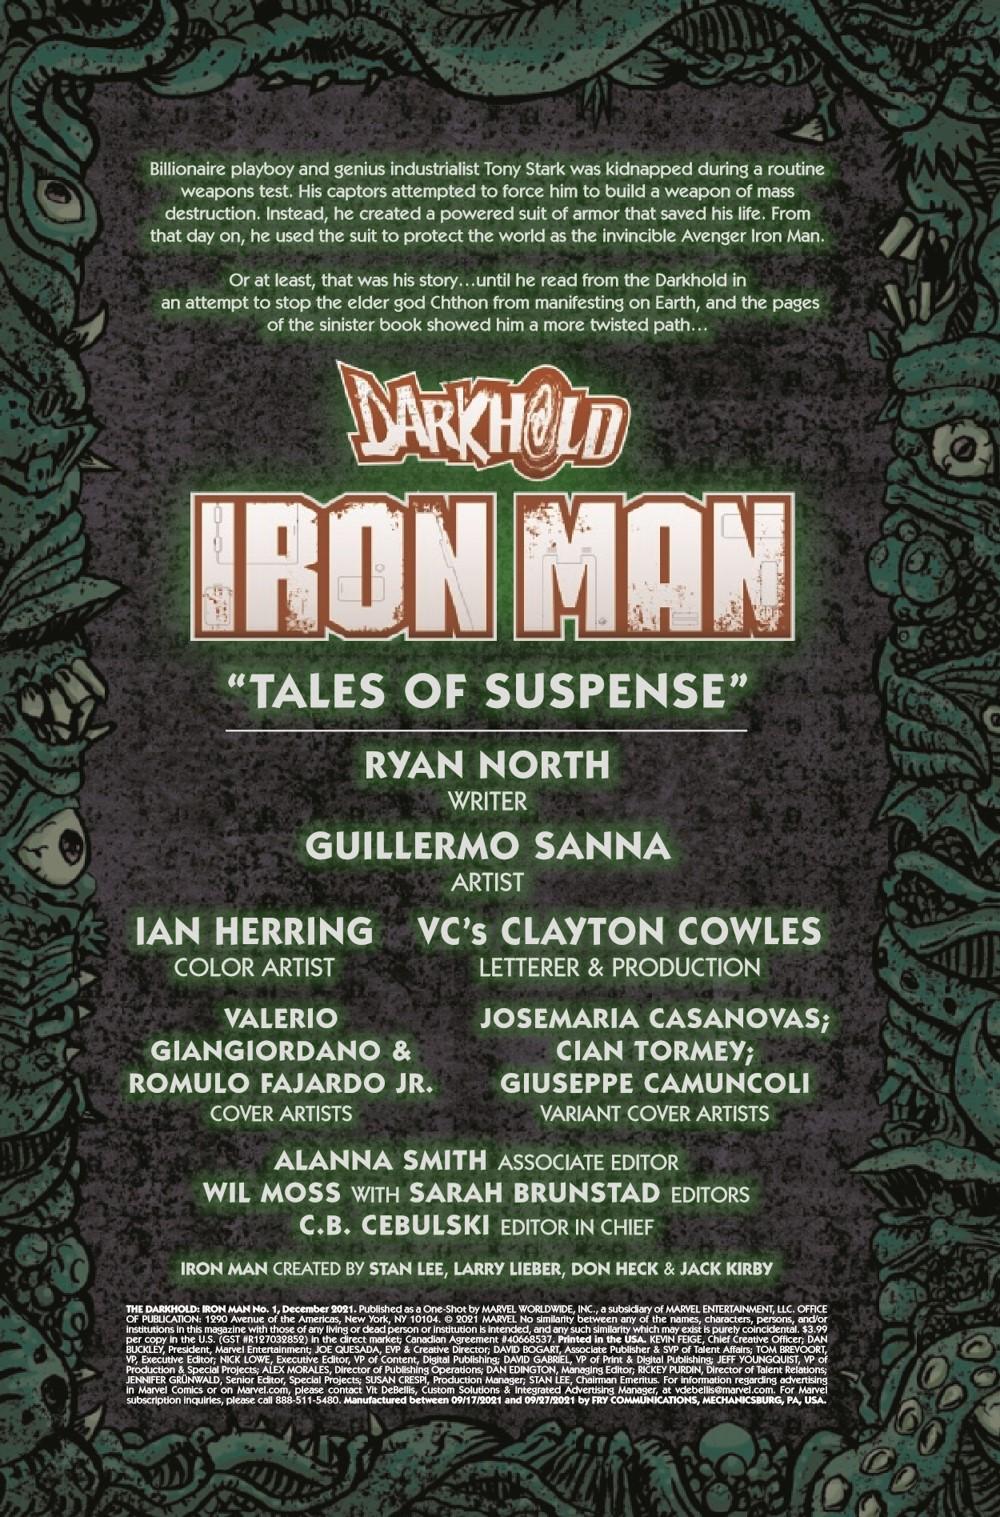 DARKHOLDIM2021001_Preview-2 ComicList Previews: DARKHOLD IRON MAN #1